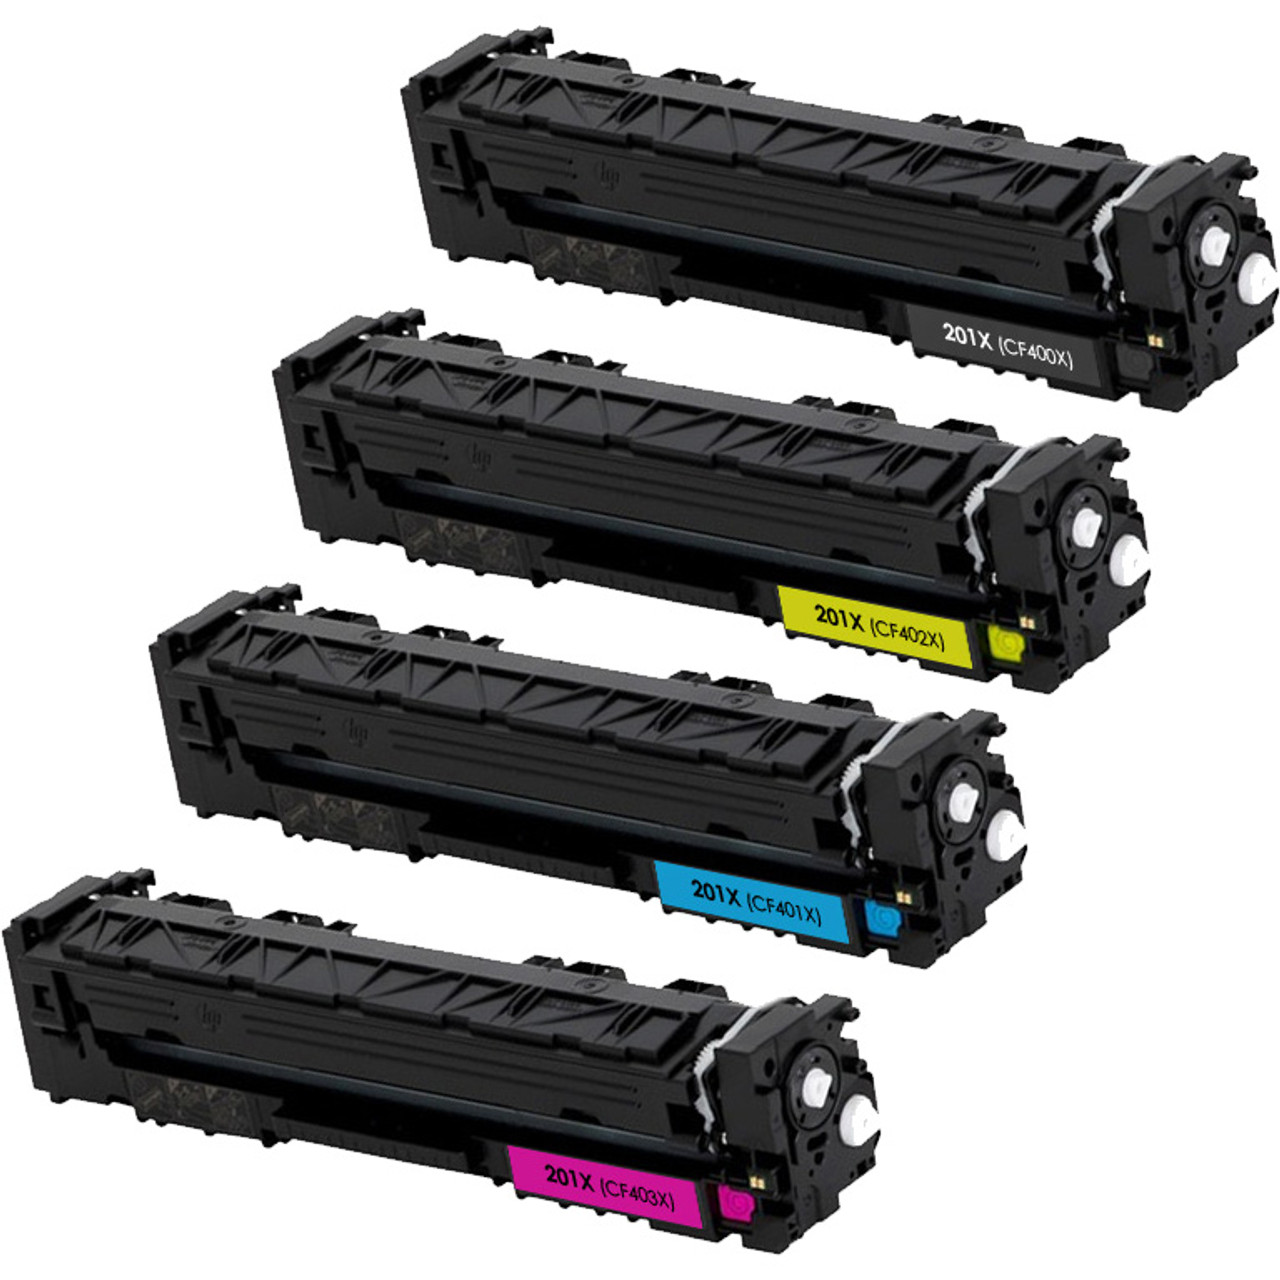 Seagate 8TB SKYHAWK SATA 3.5 Hard Drive FW AV01 ST8000VX0022 PN 2EJ112-300